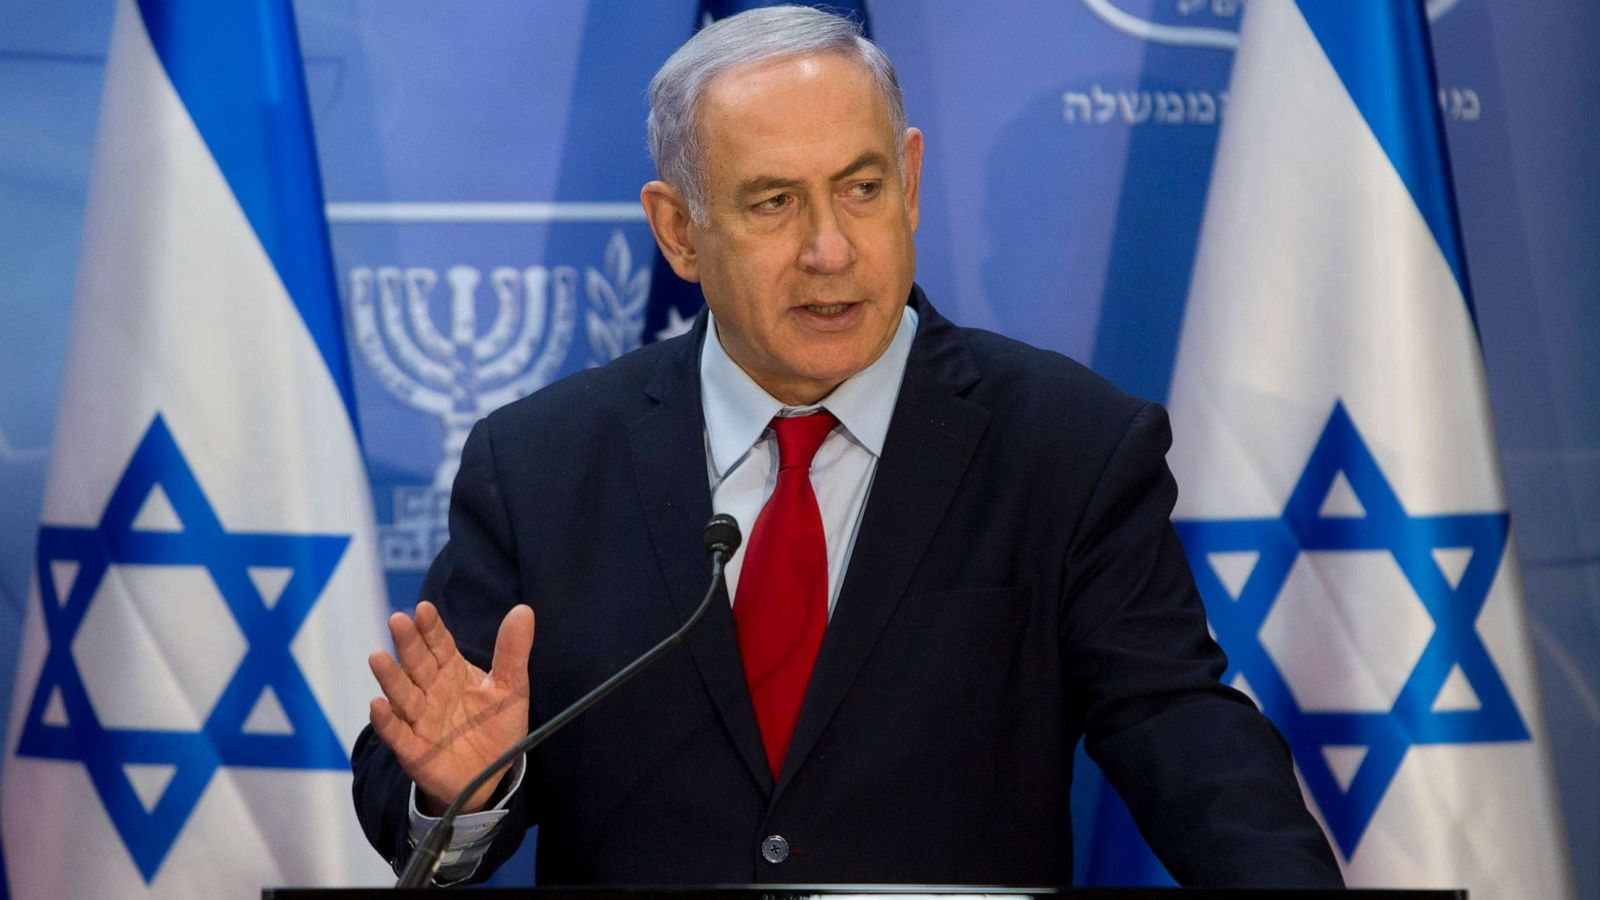 Benjamin Netanyahu Has Been Impeached As Israel Prime Ministe